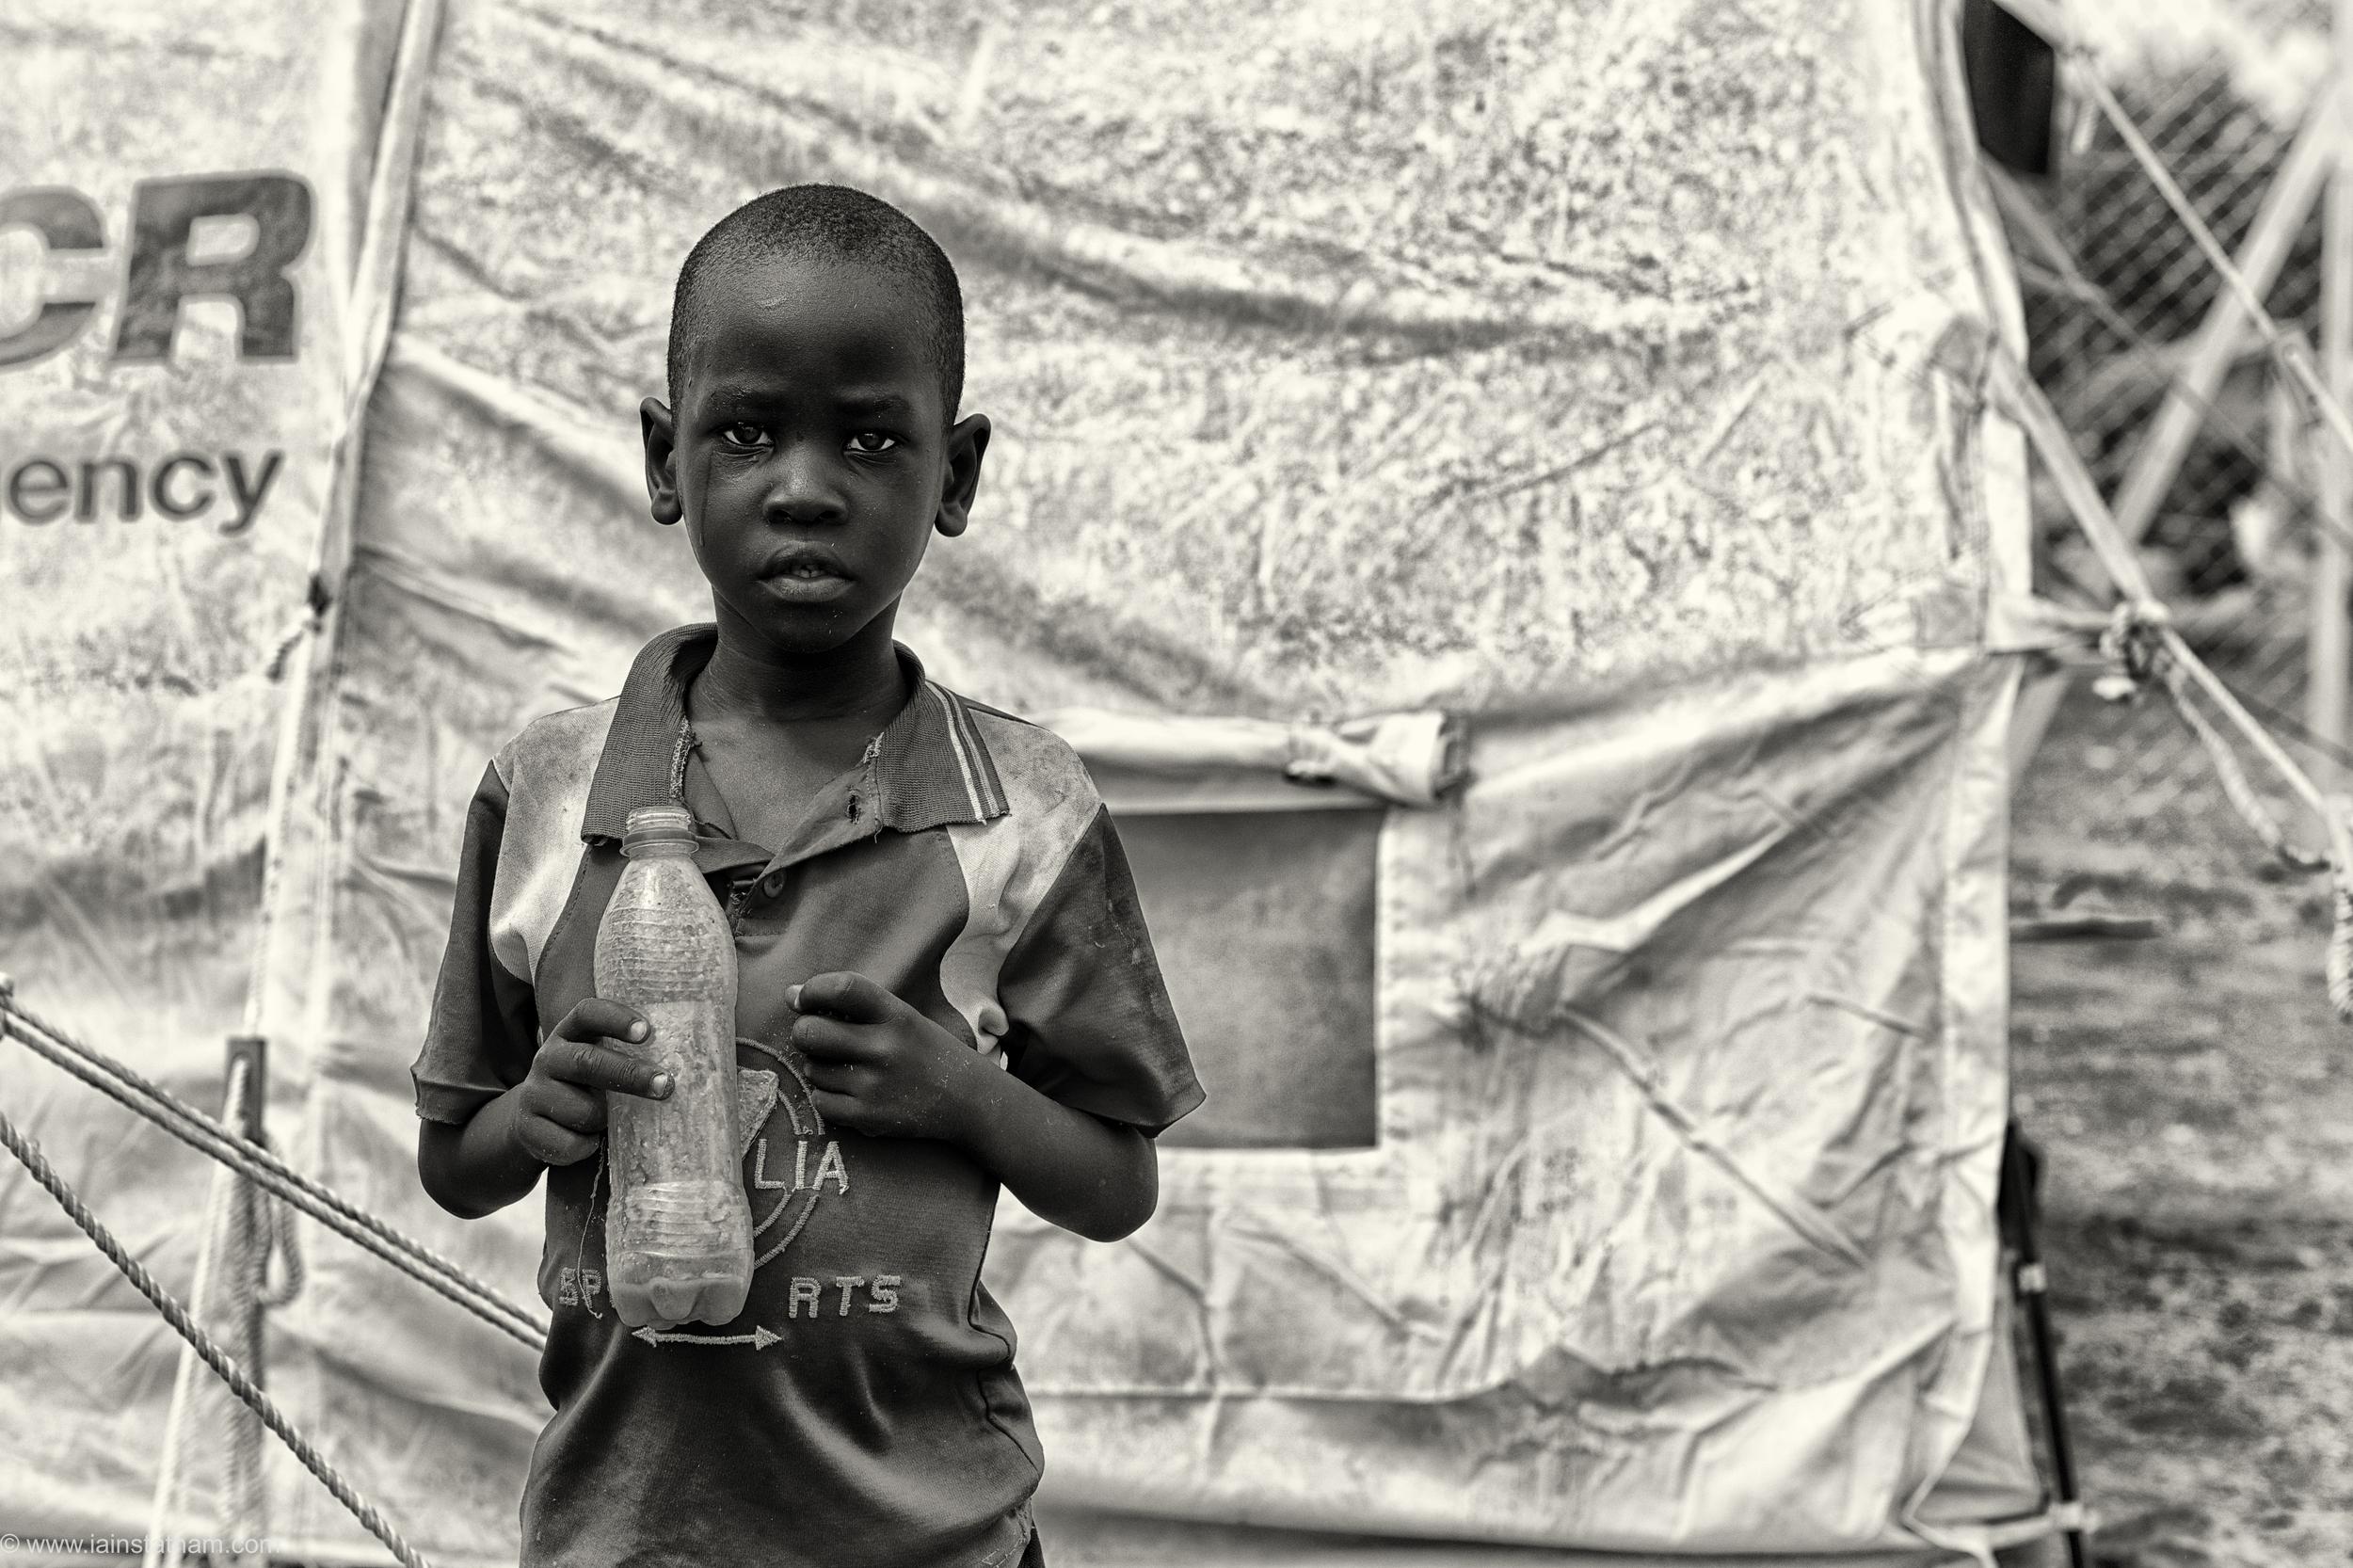 ug - south sudan refugees - dziapi - bw-16.jpg